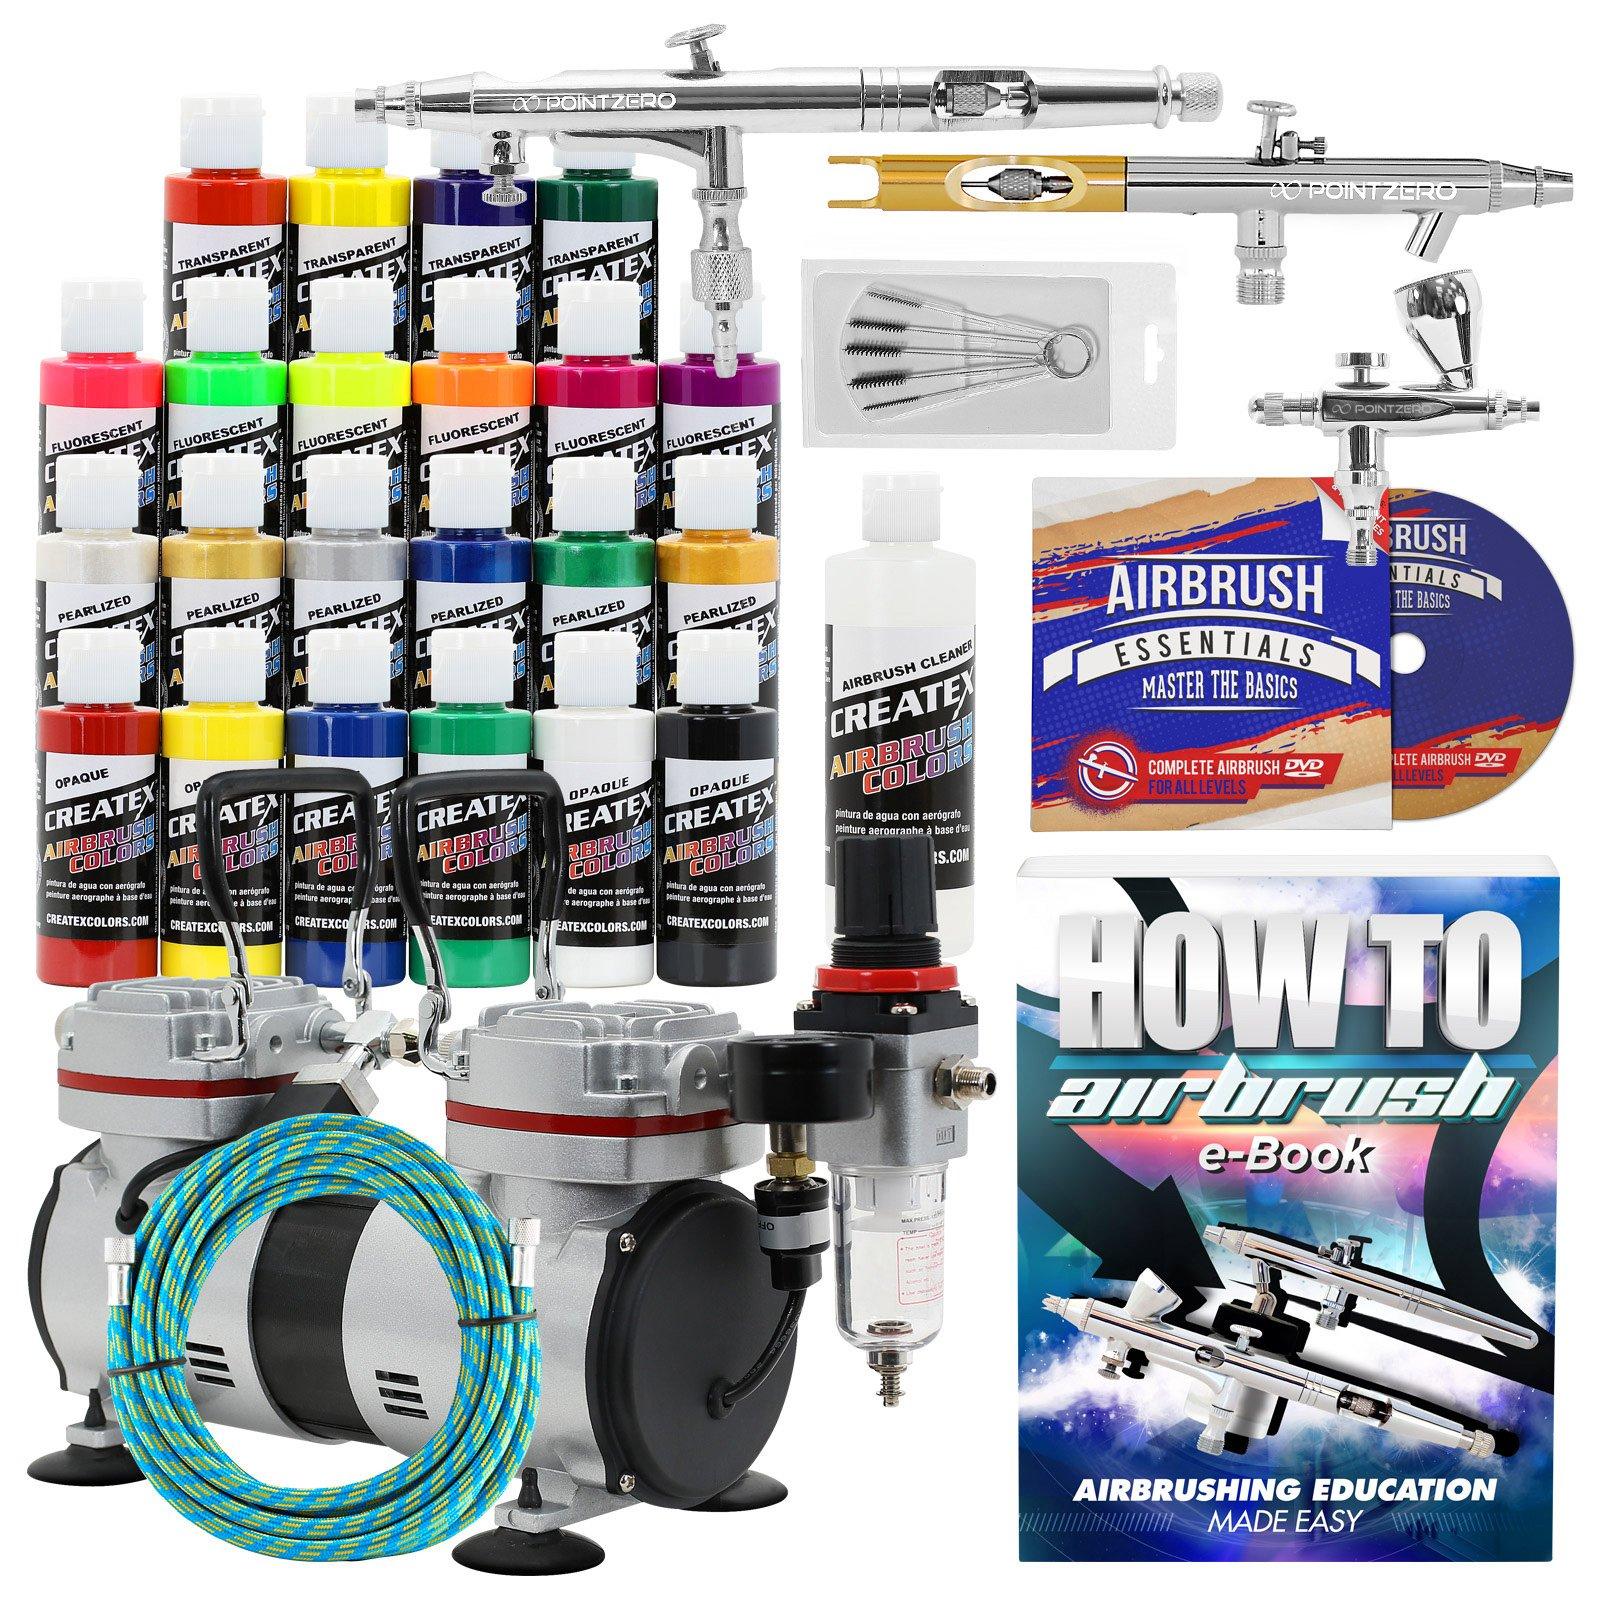 PointZero Multi-Purpose 3 Airbrush Kit w/Compressor and Createx Colors Set of 22 Paints